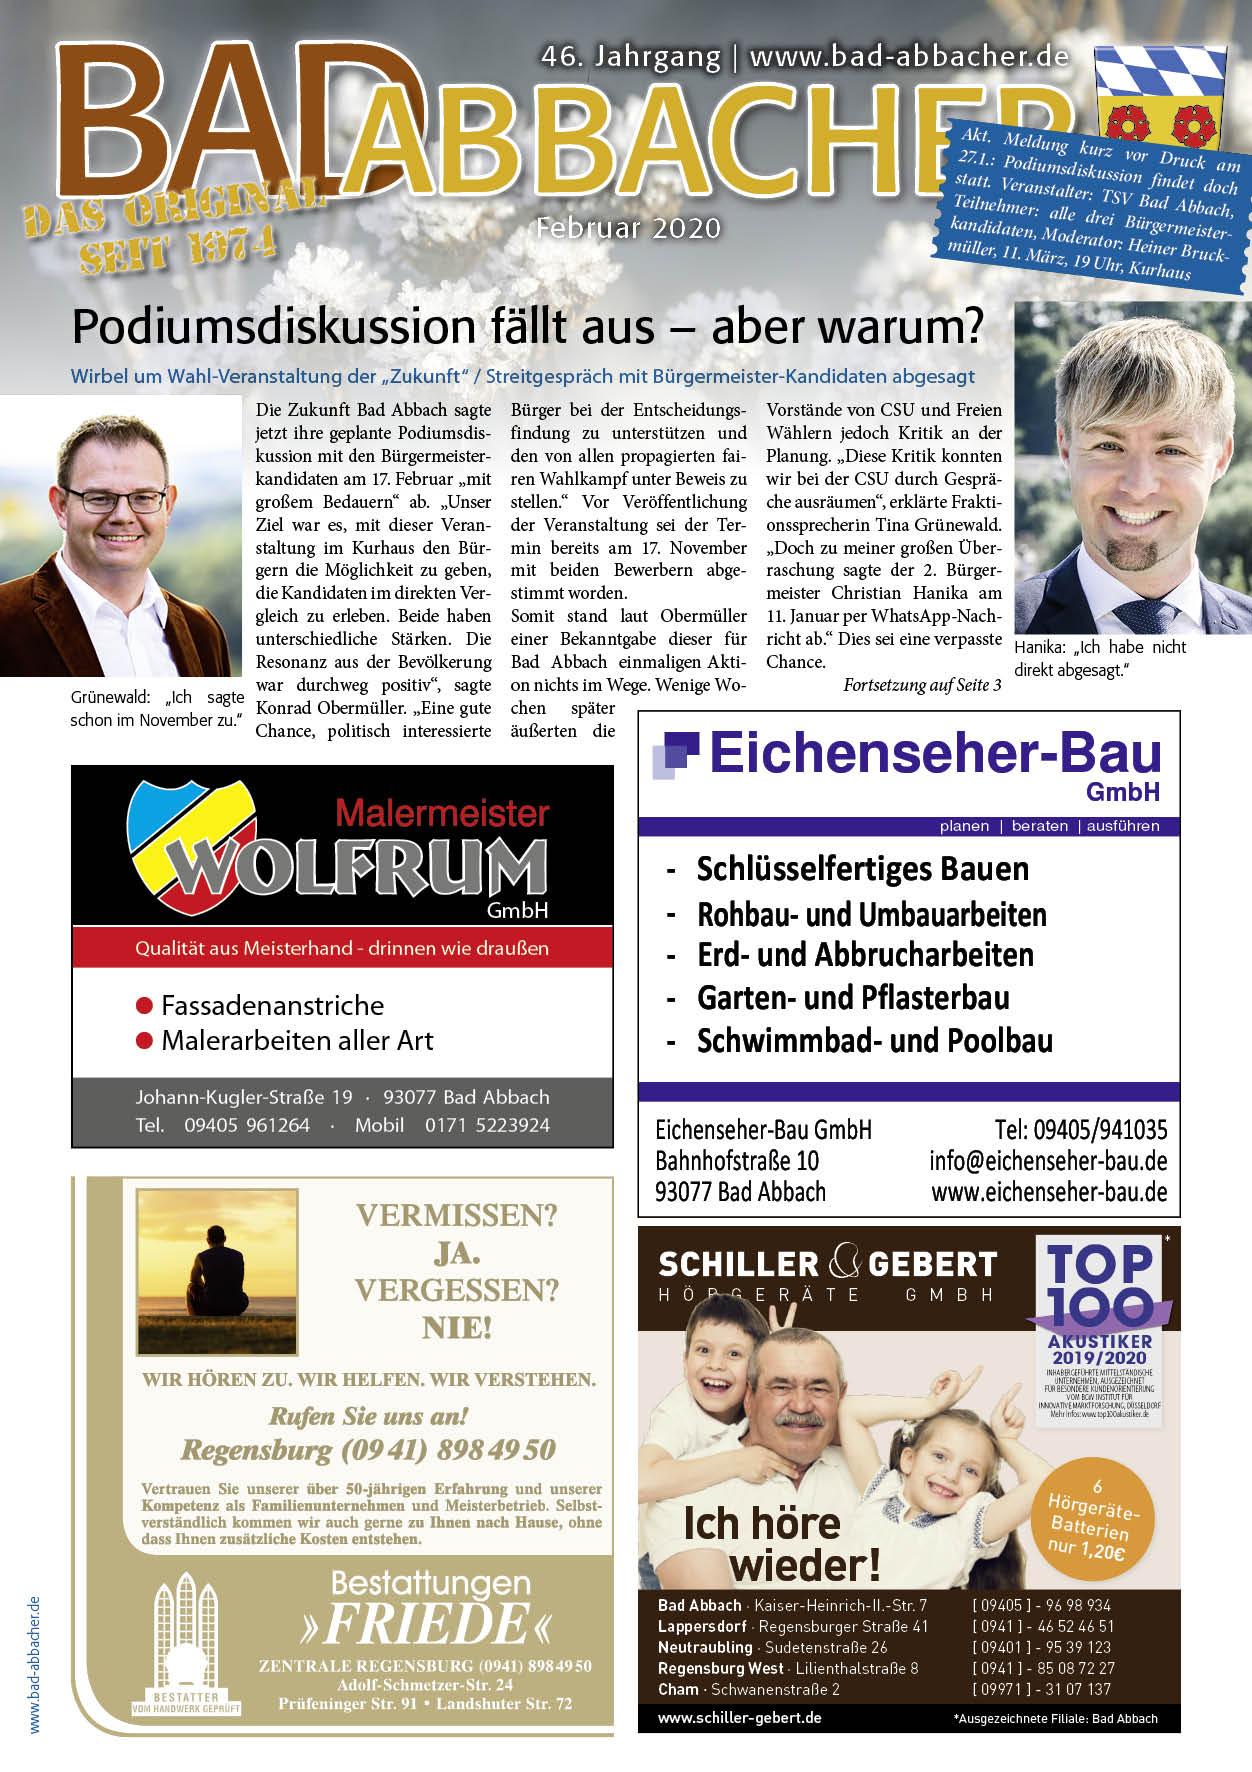 Bad-Abbacher_2020-02